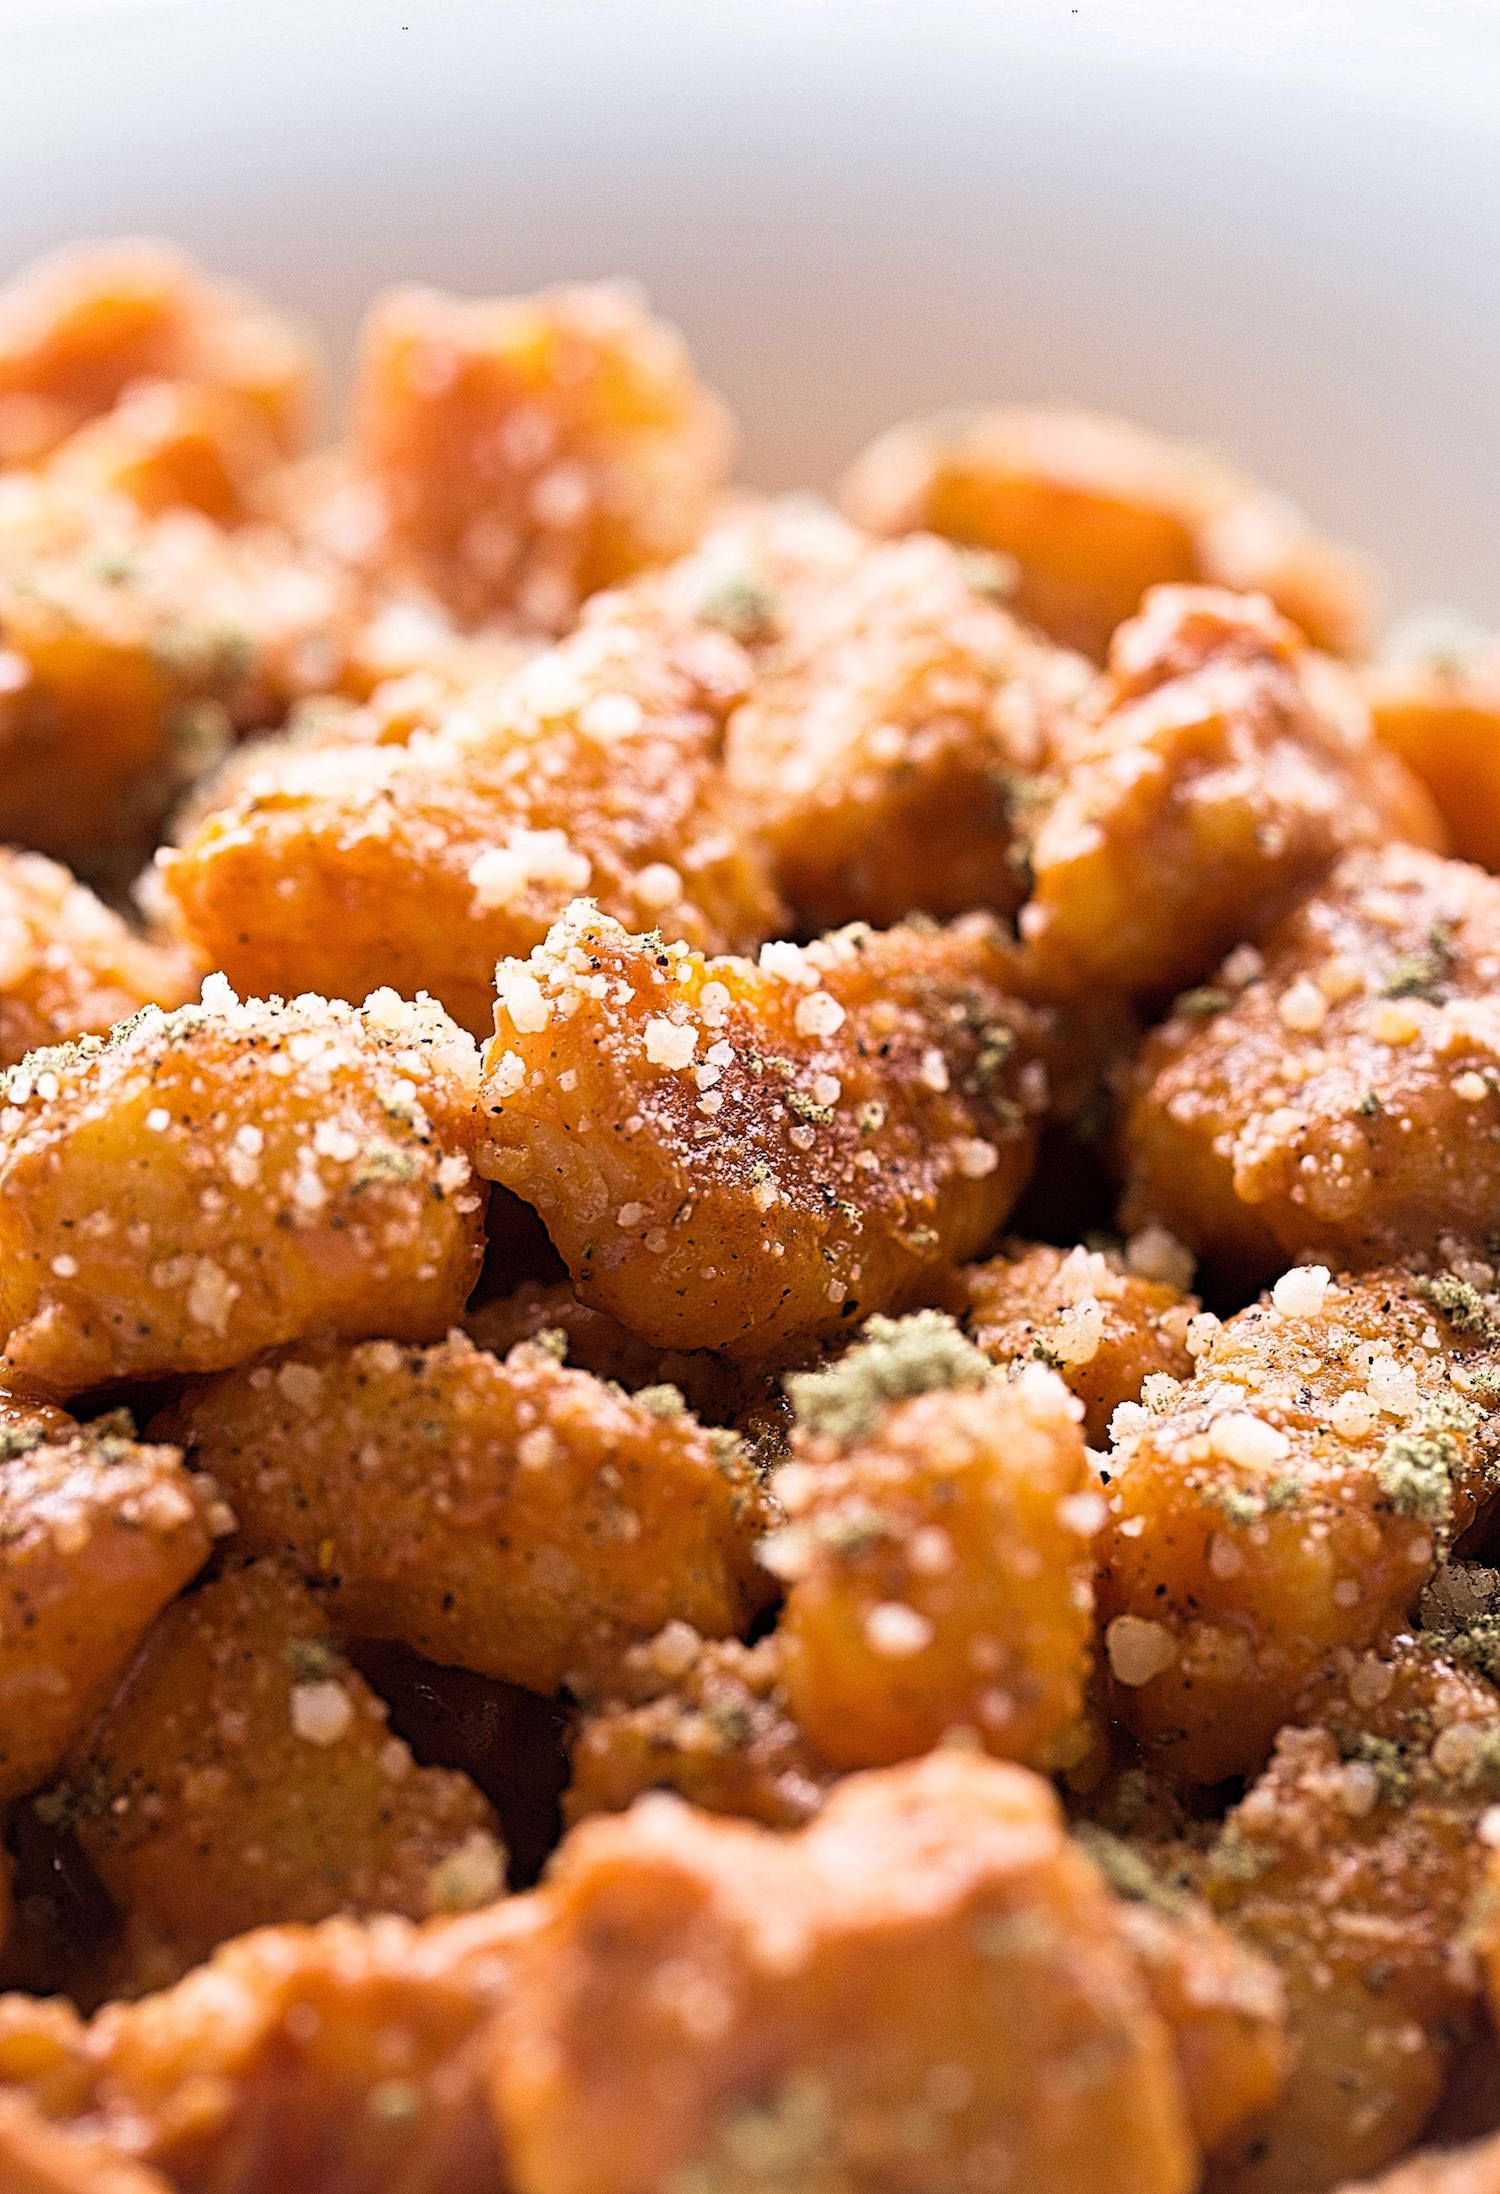 Sweet Potato Gnocchi with Tomato Cream Sauce: soft, pillowy, toasted sweet potato gnocchi in an easy tomato cream sauce. Best dinner!   TrufflesandTrends.com